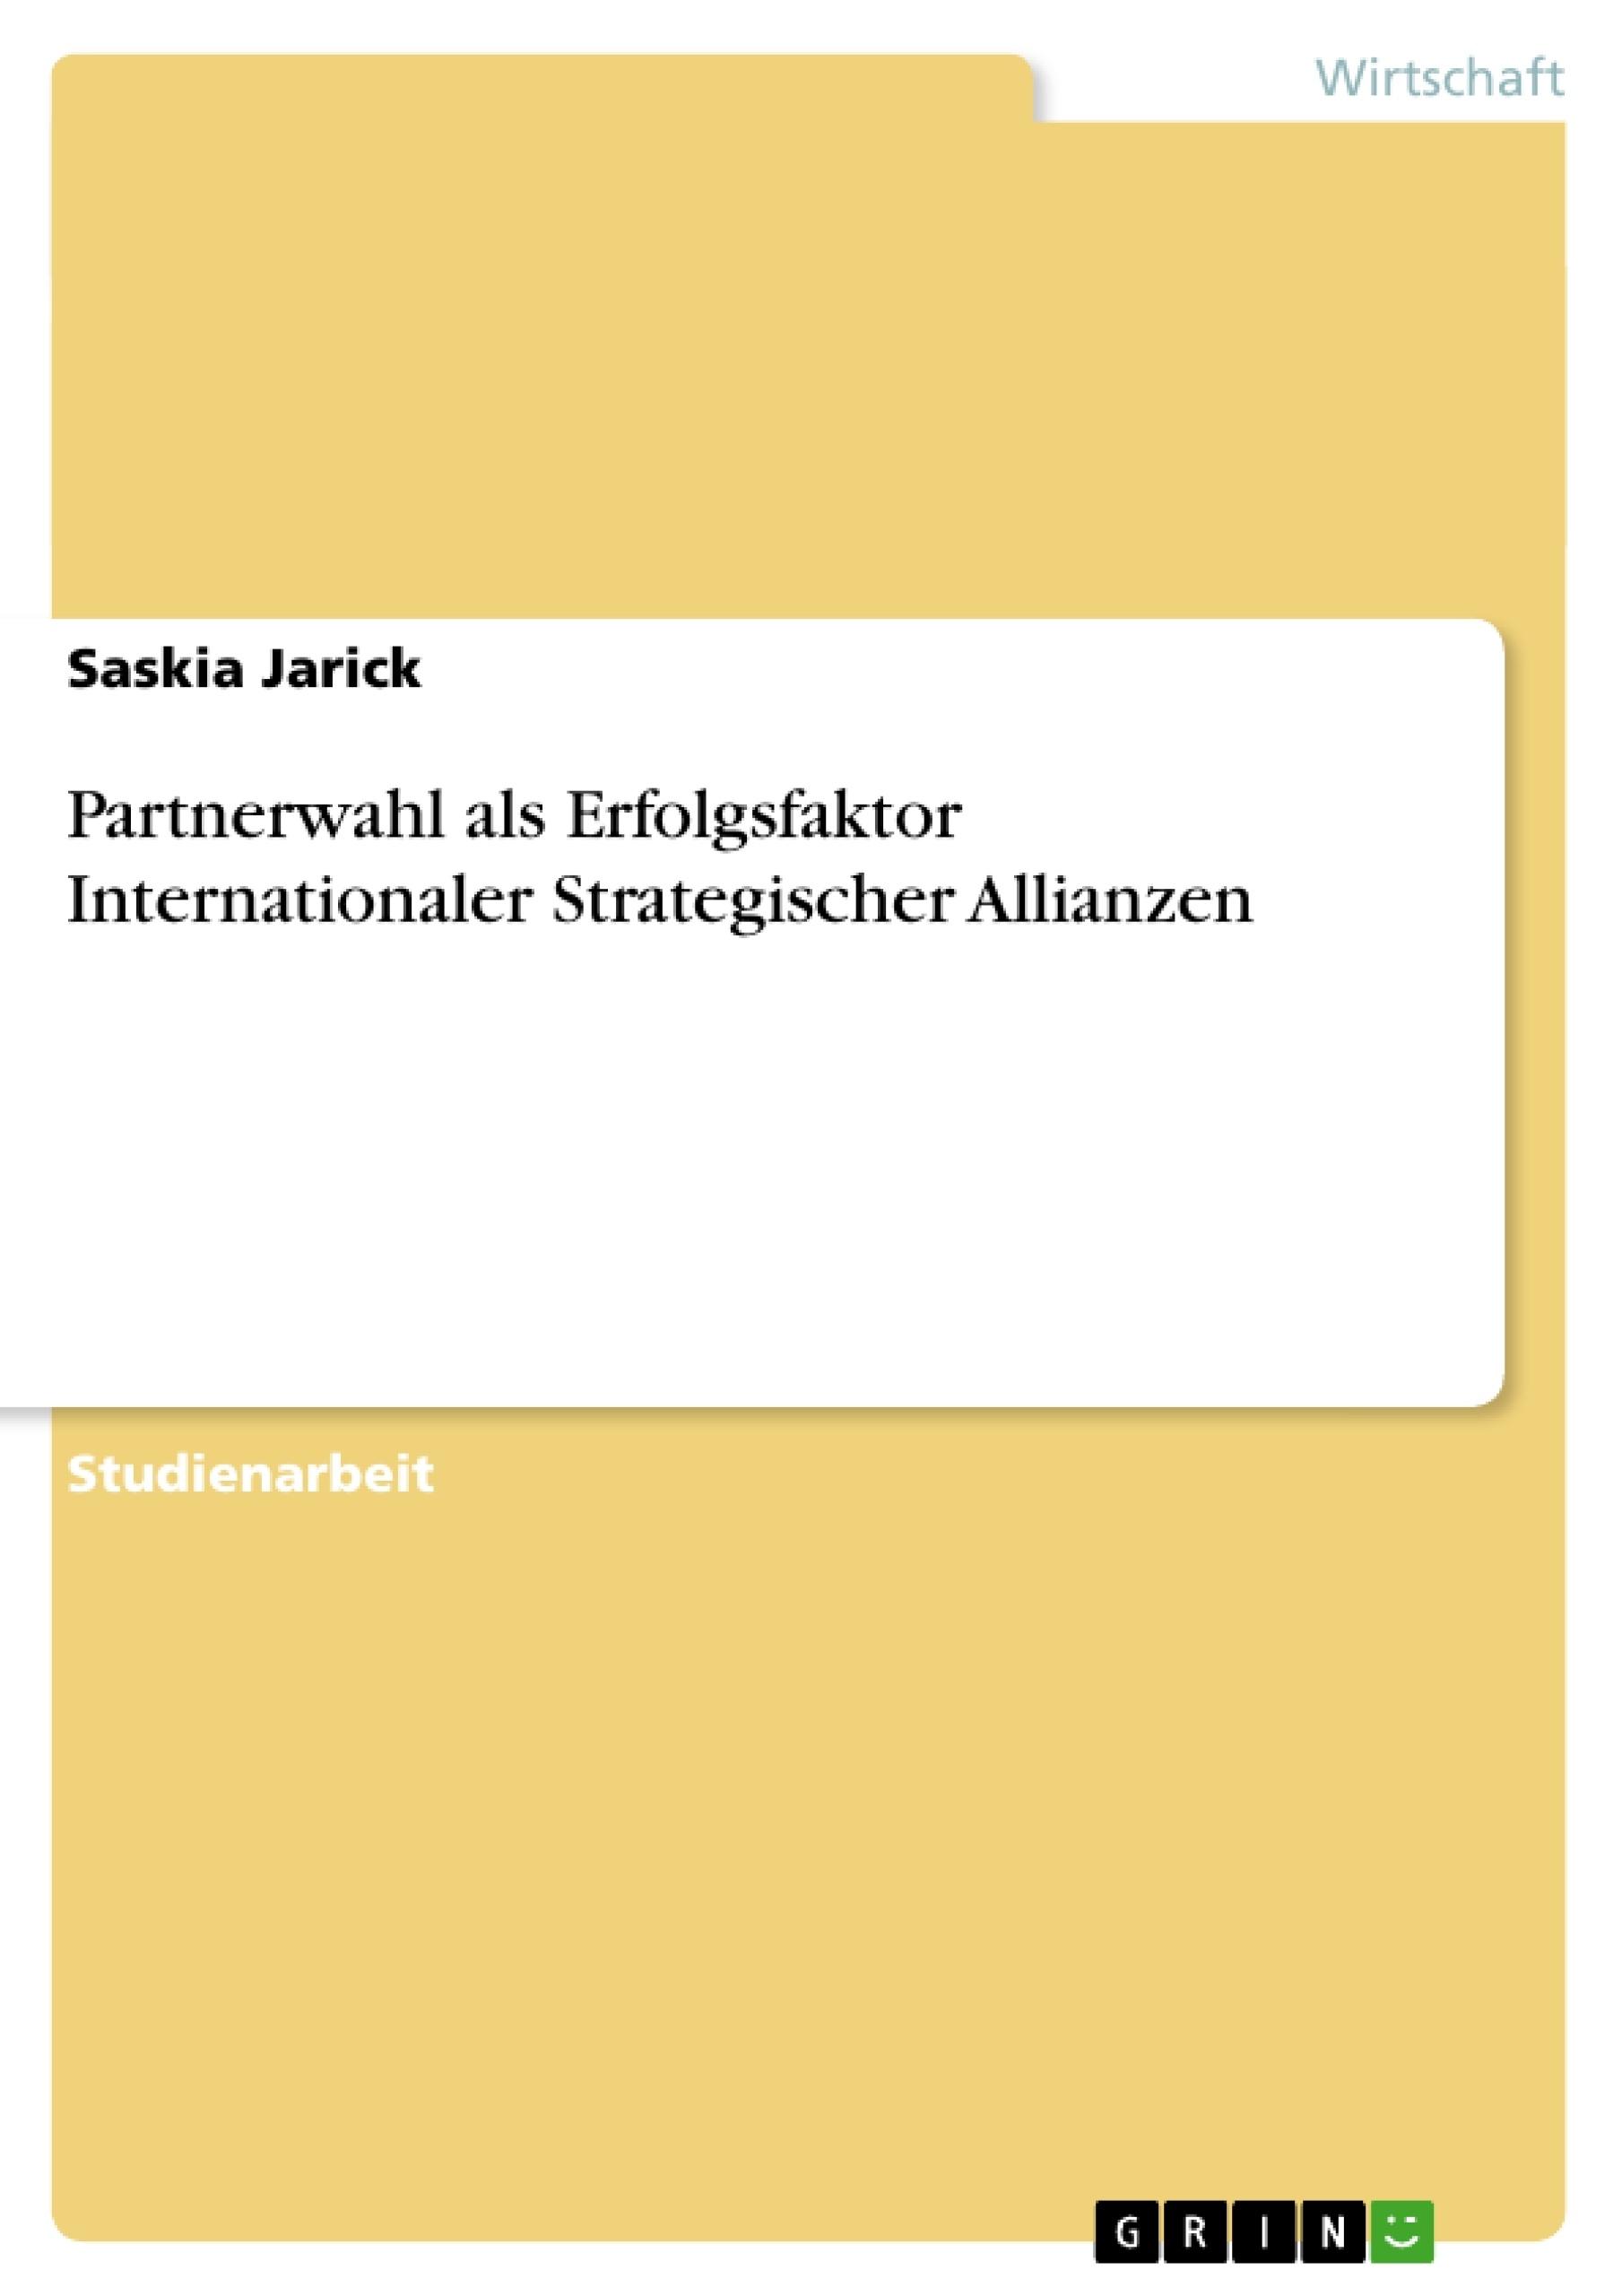 Titel: Partnerwahl als Erfolgsfaktor Internationaler Strategischer Allianzen